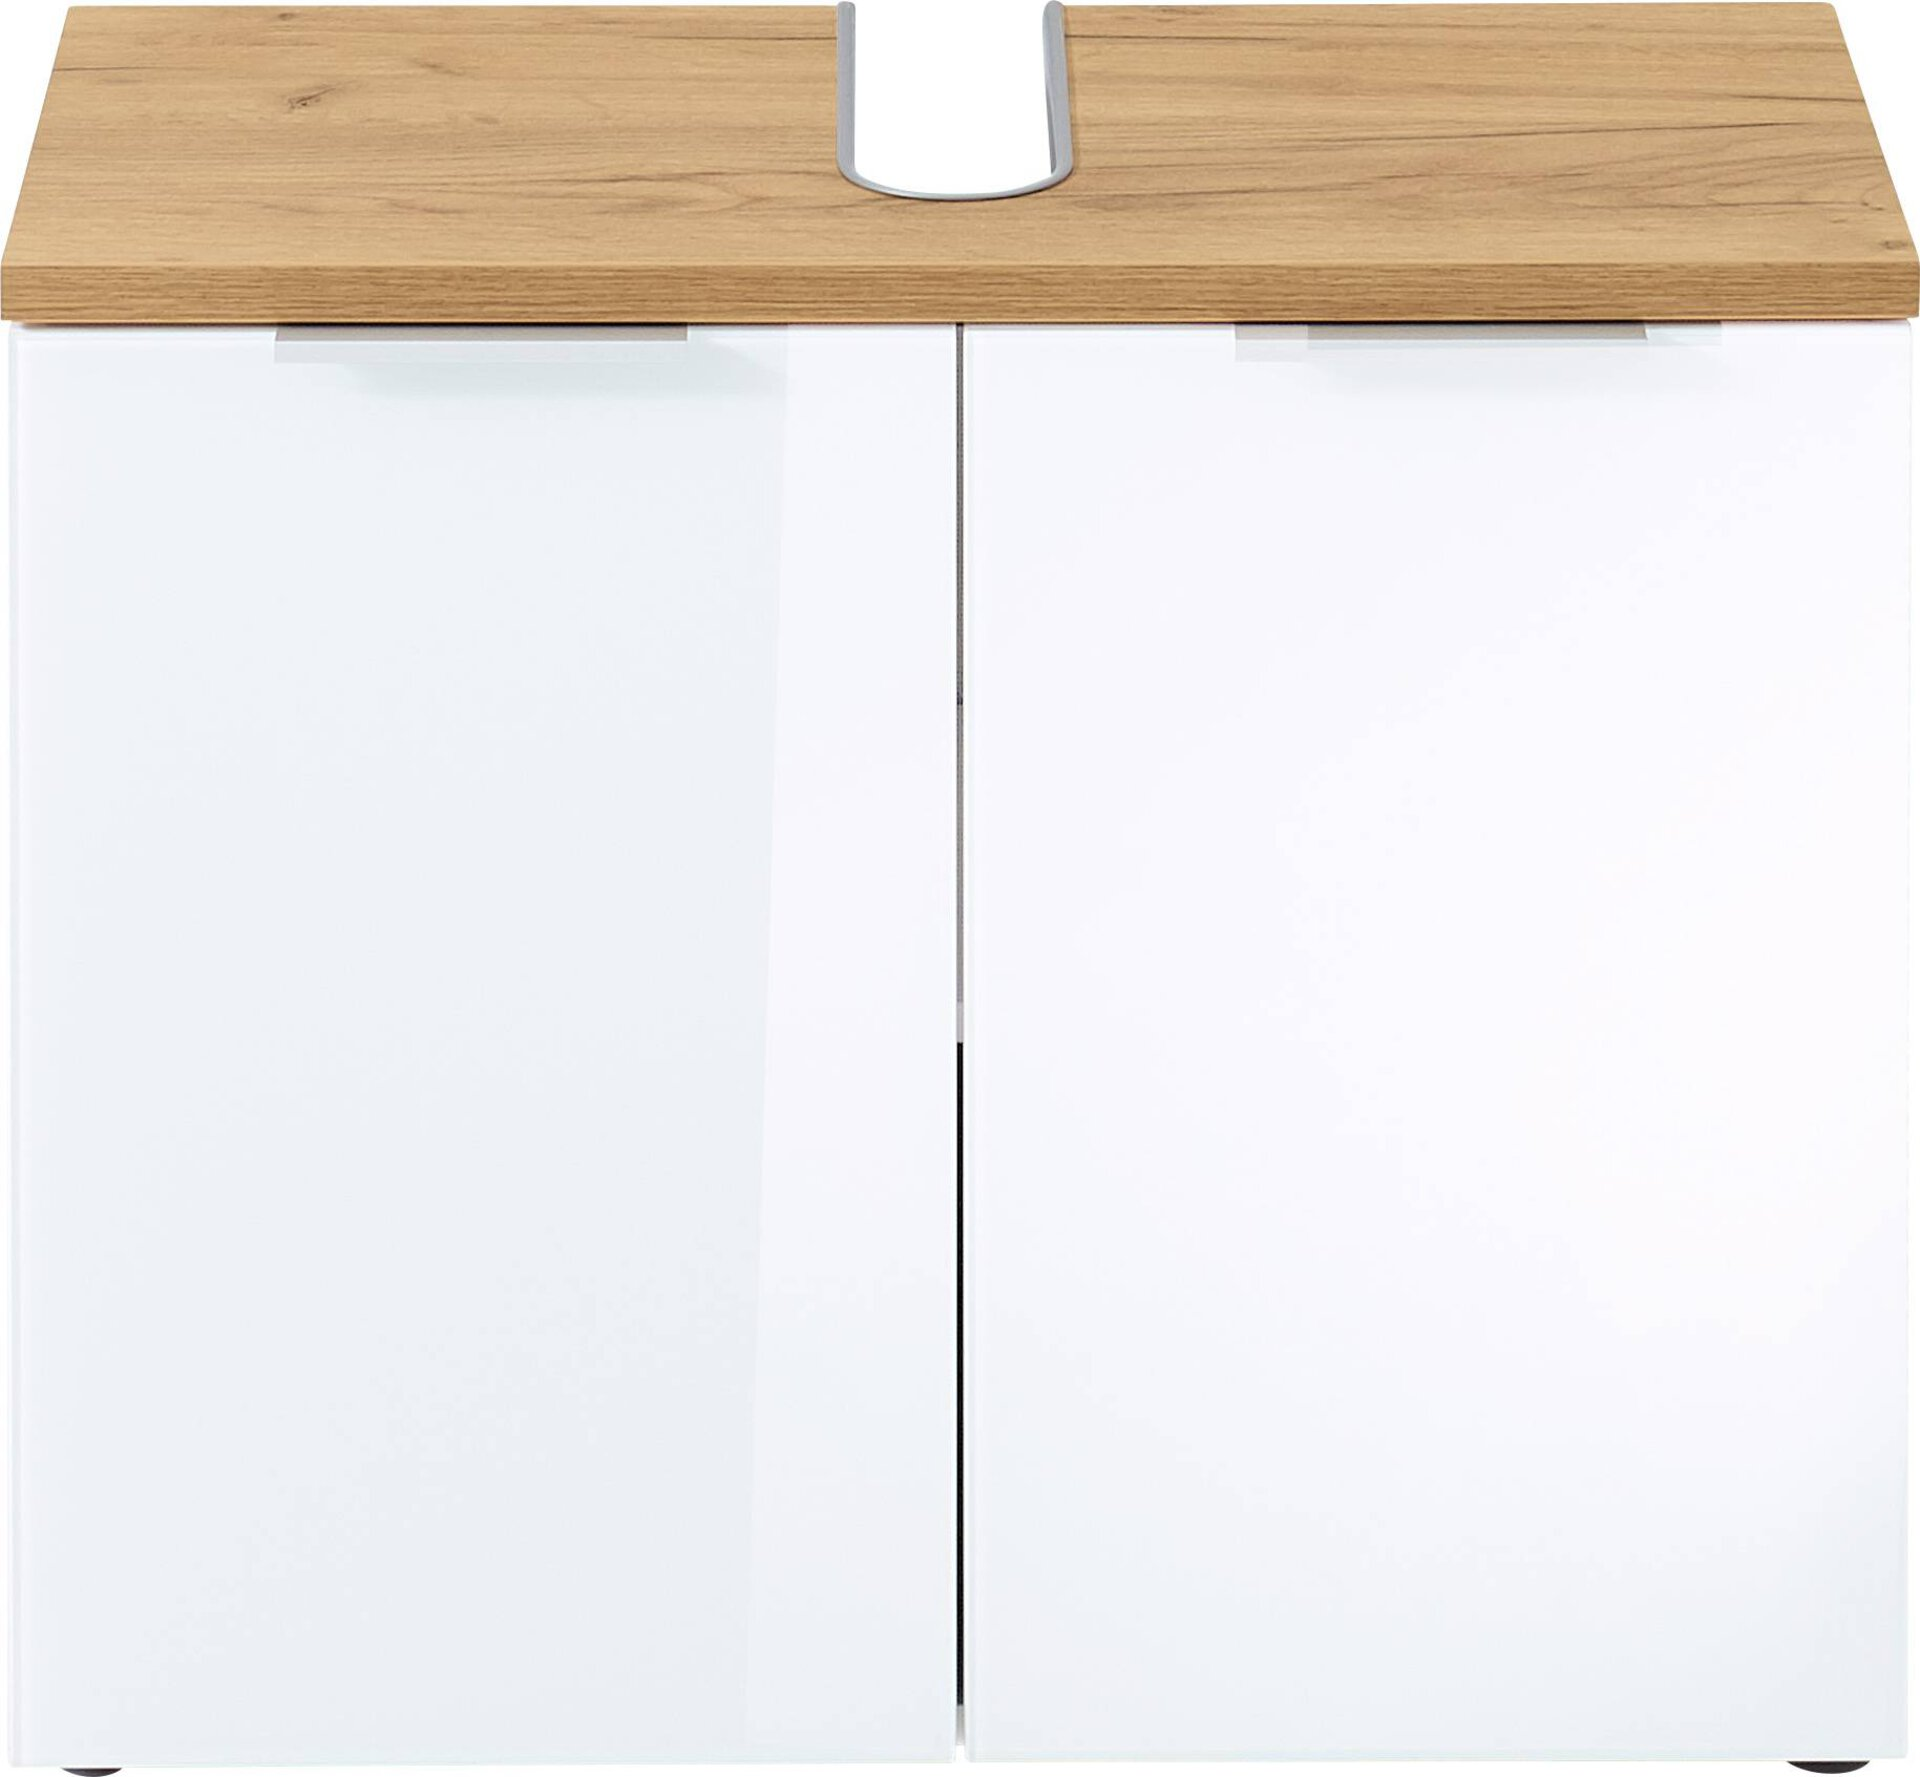 Waschbeckenunterschrank GW-PESCARA Germania Metall weiß 34 x 58 x 70 cm